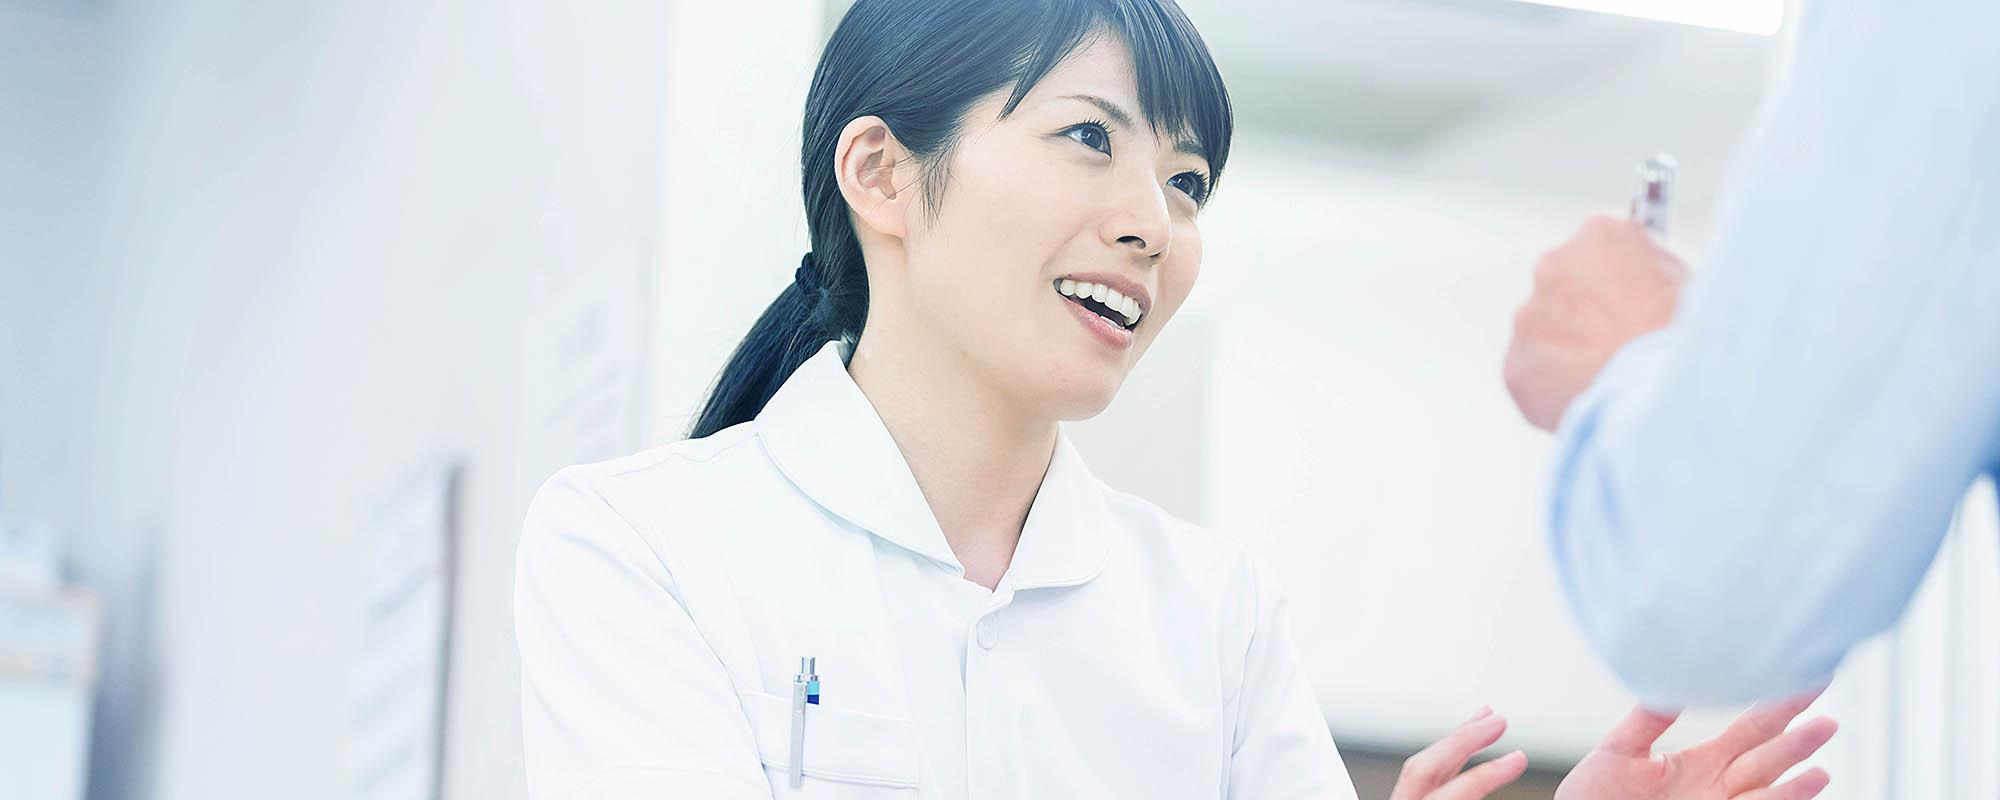 yakkyoku image